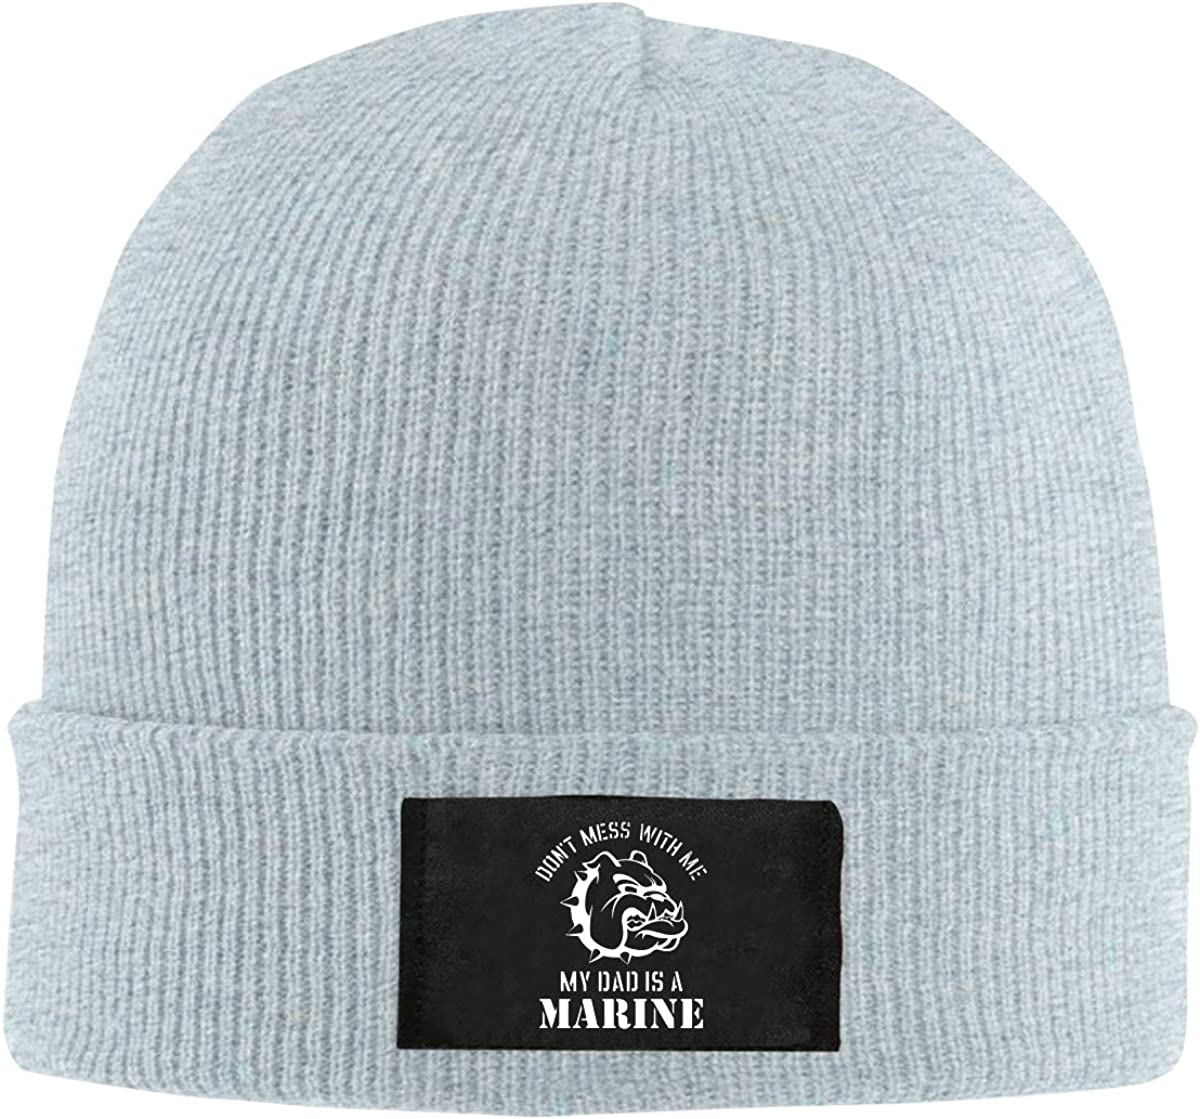 Mess with Me My Dad is A Marine Unisex Warm Winter Hat Knit Beanie Skull Cap Cuff Beanie Hat Winter Hats